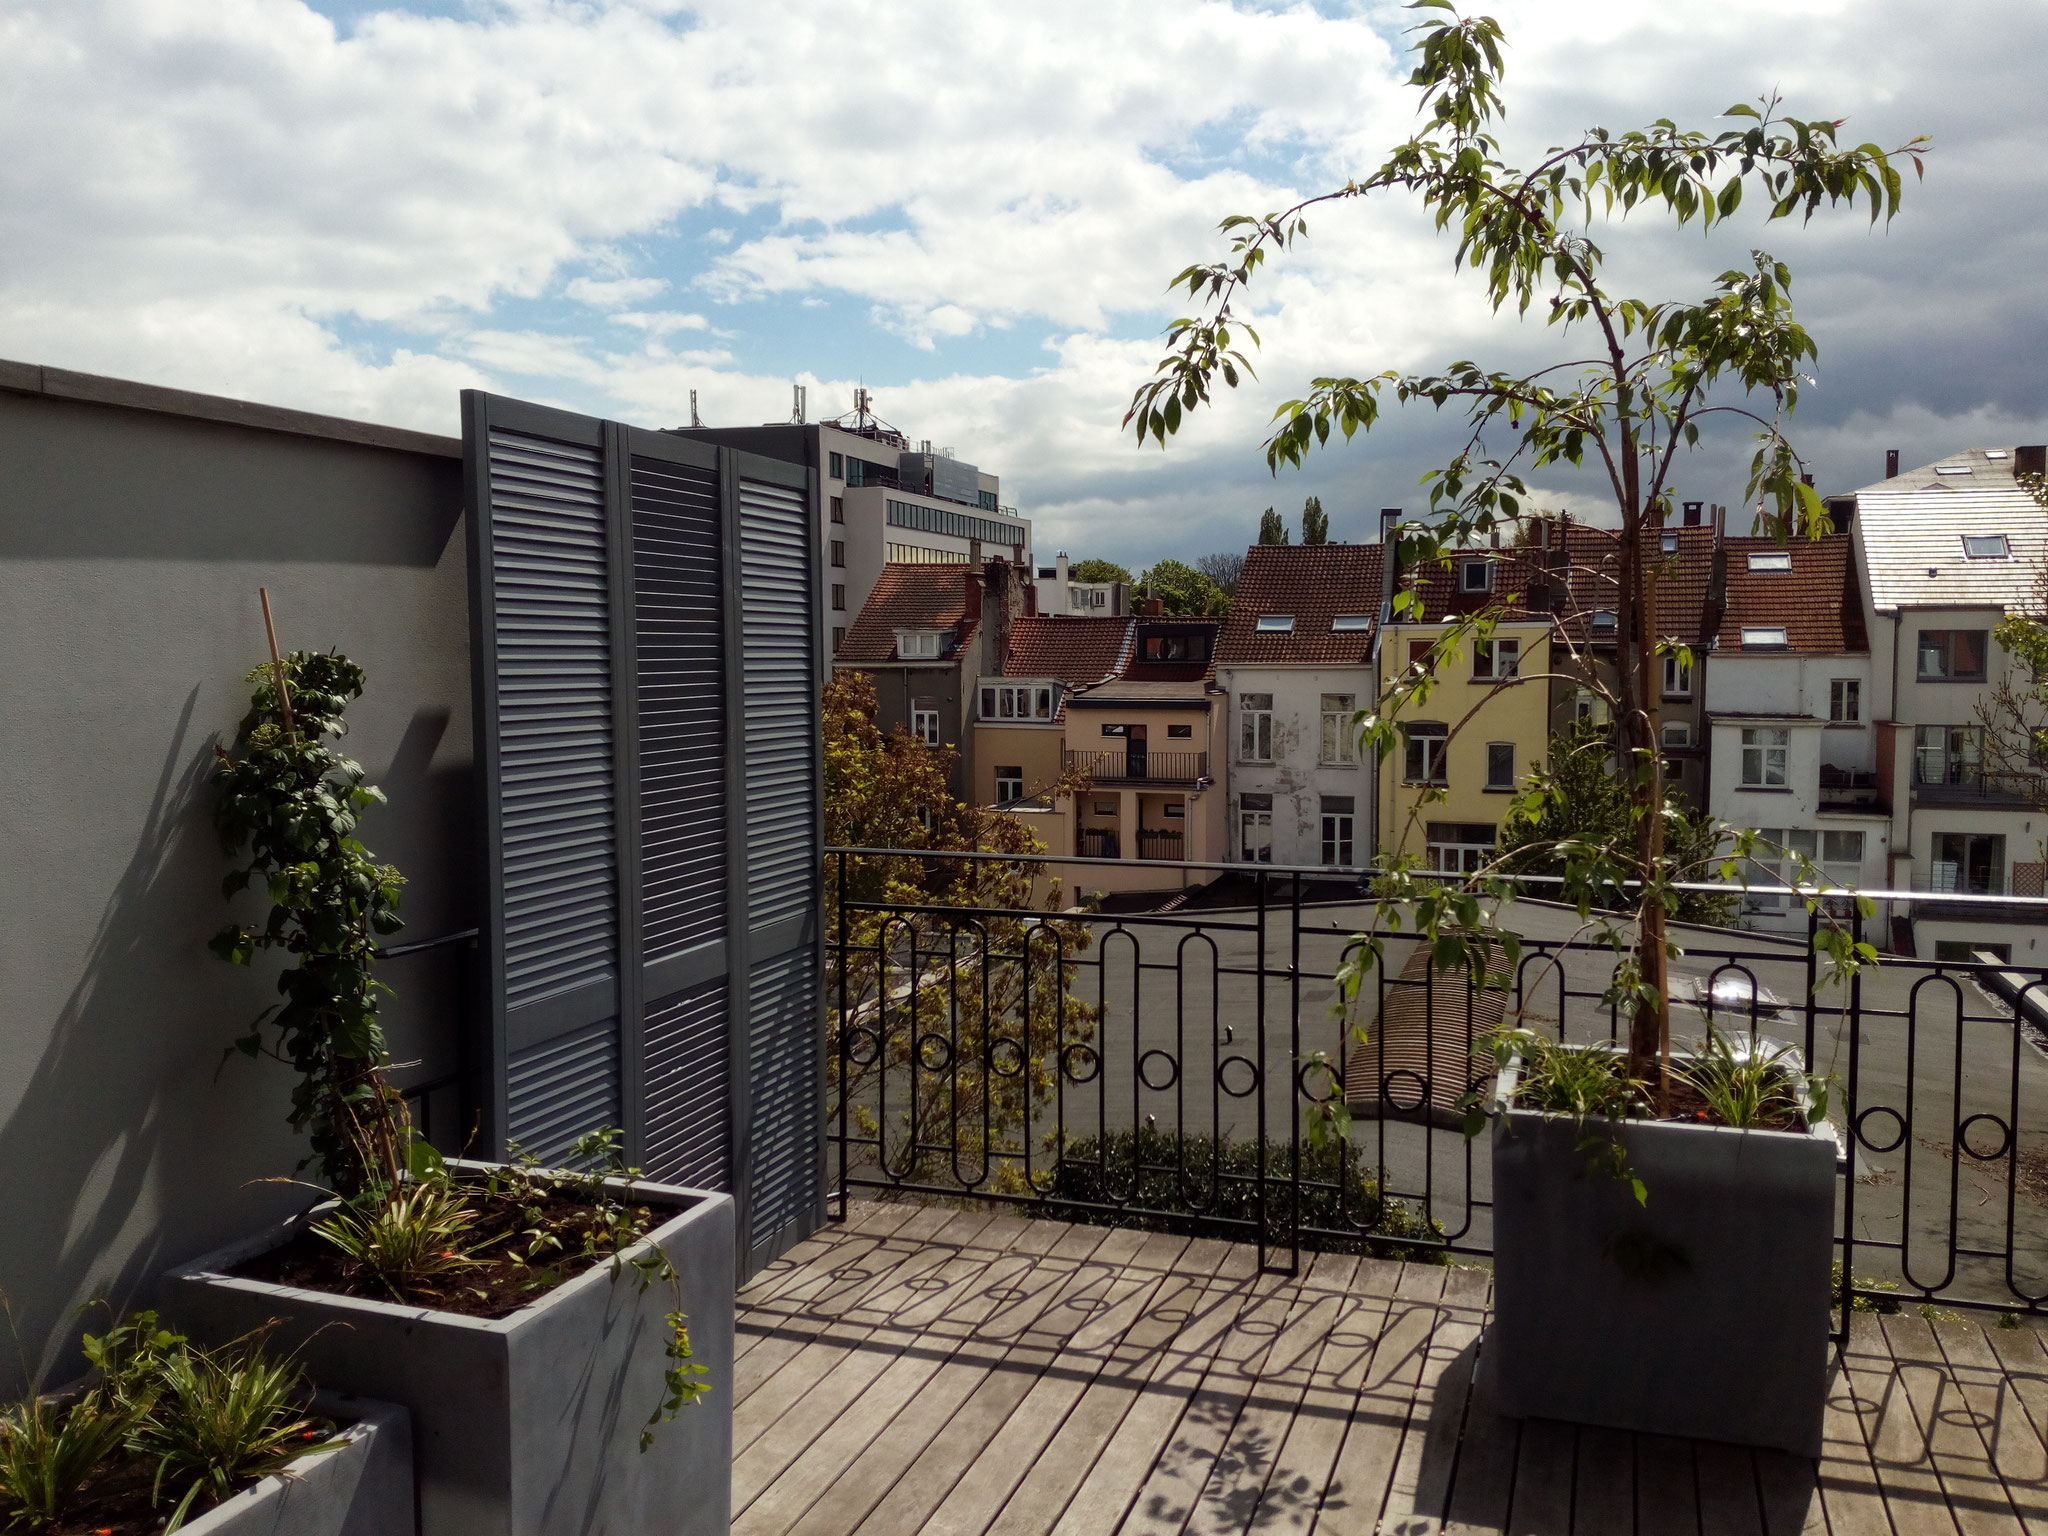 Terrasse 30m2 - Ambiance verger fleuri - Partie gauche & face - Amenagement jardin Bruxelles